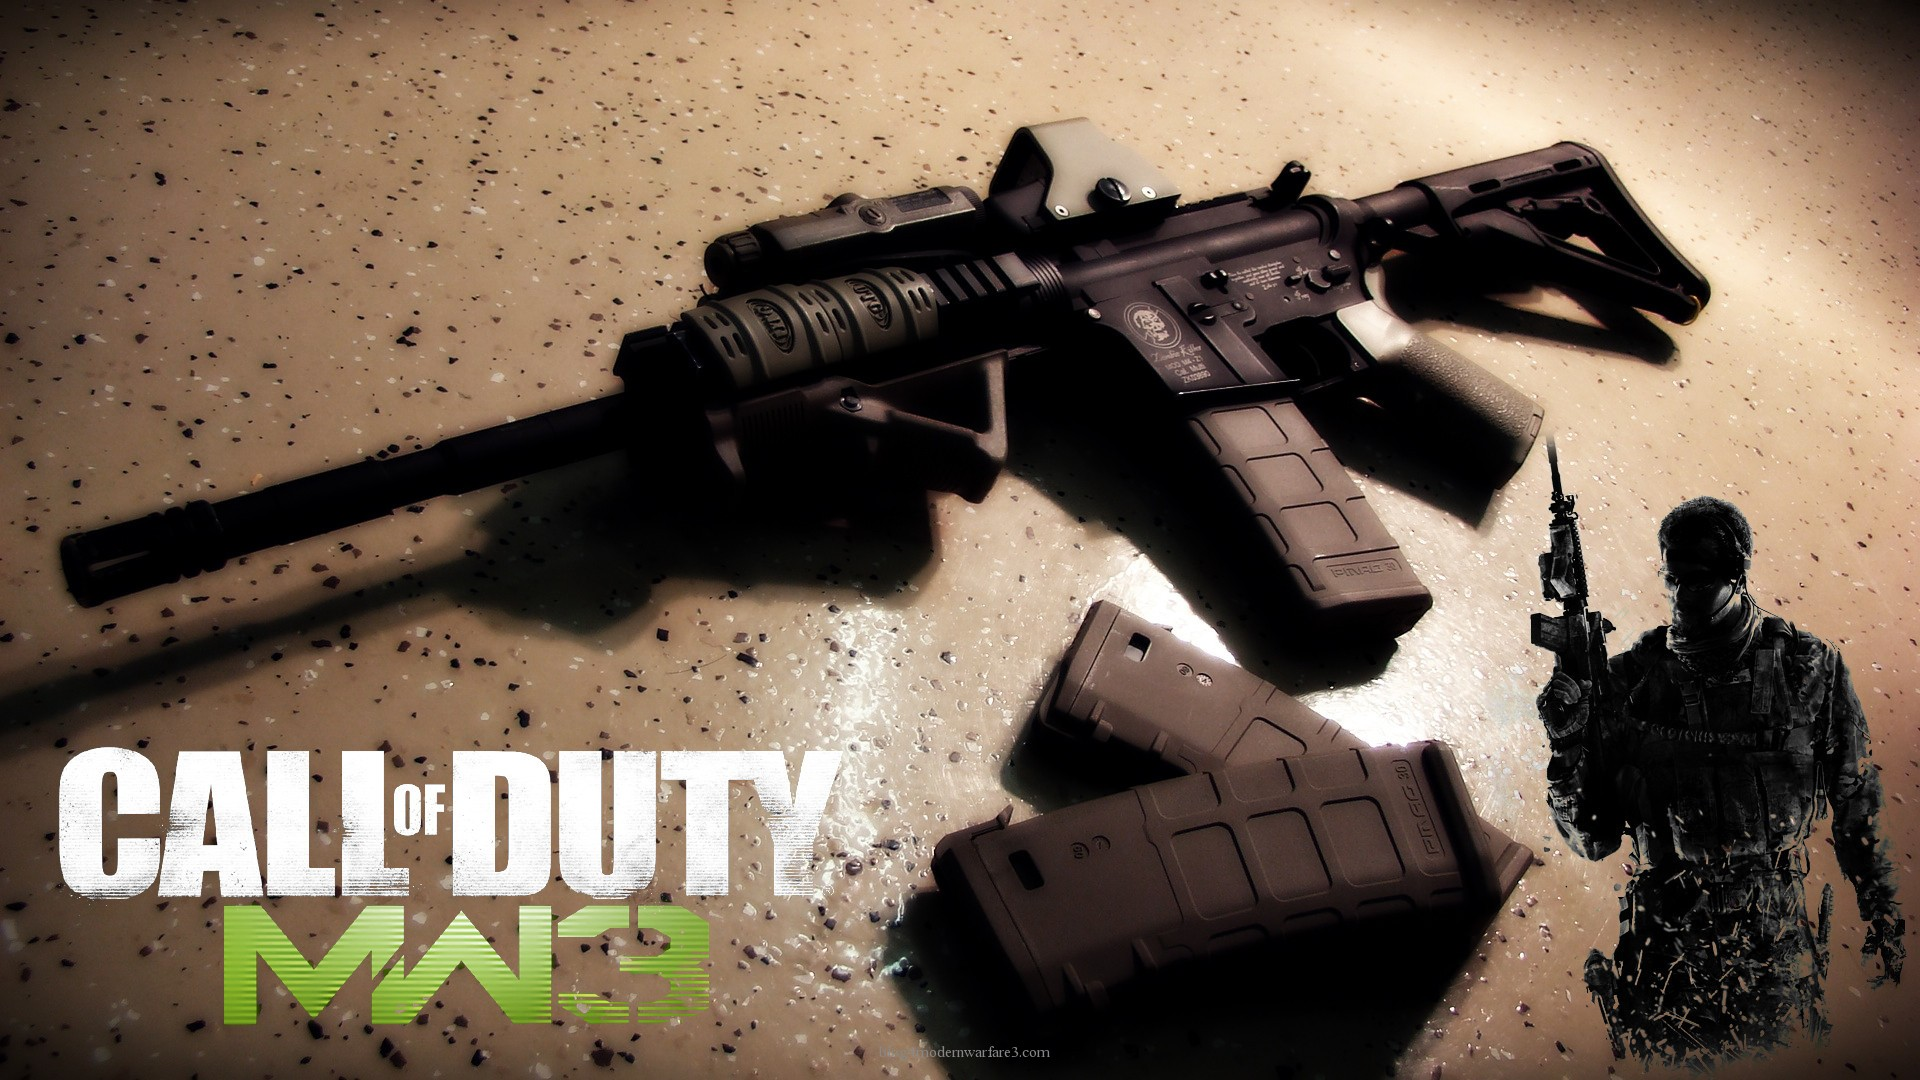 Call Of Duty Modern Warfare 3 HD Wallpaper Games Wallpapers 1920x1080